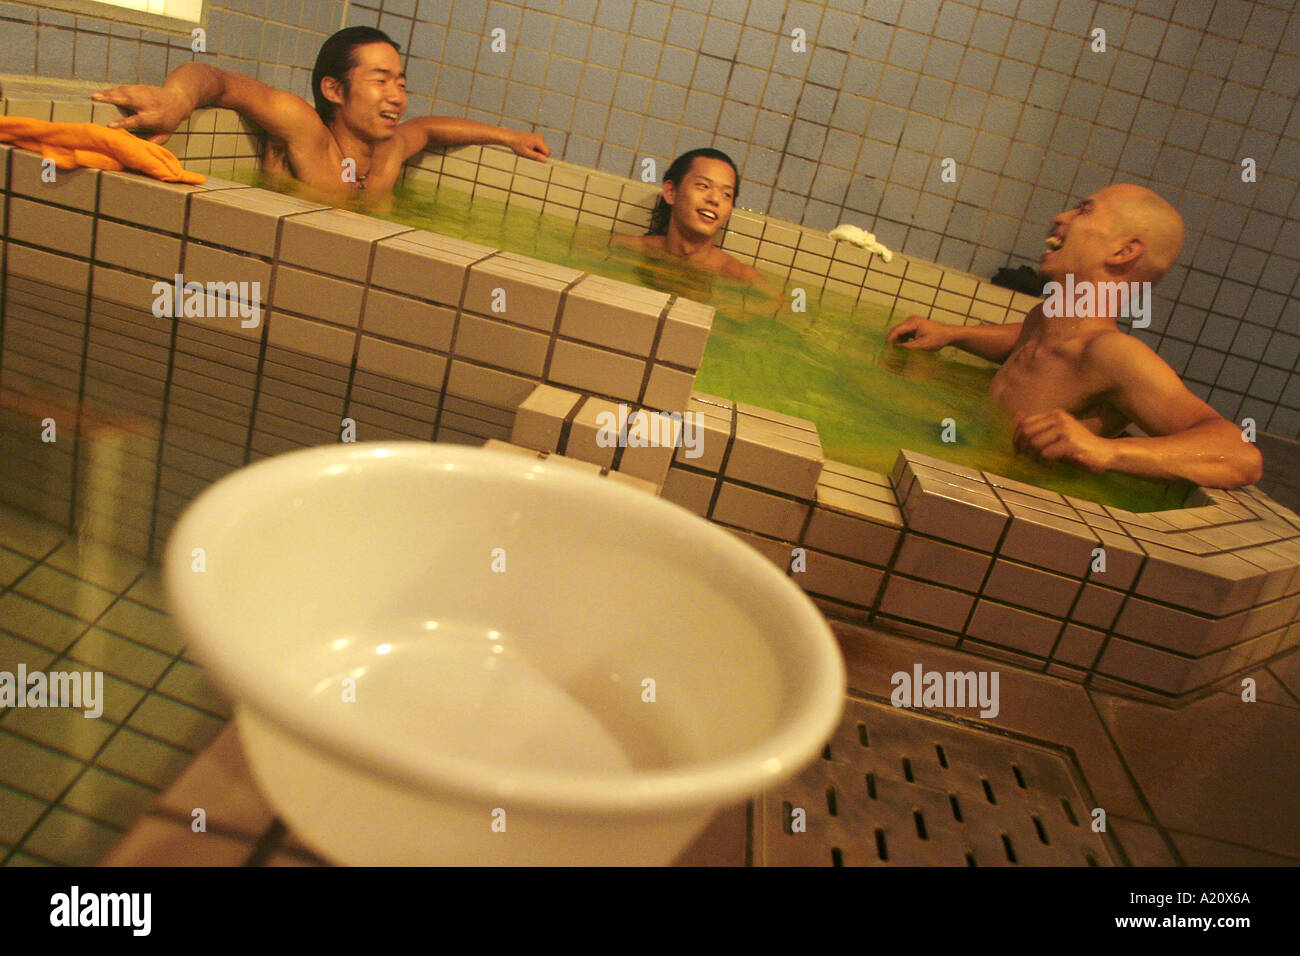 Japanese Bath House Stock Photos & Japanese Bath House Stock Images ...